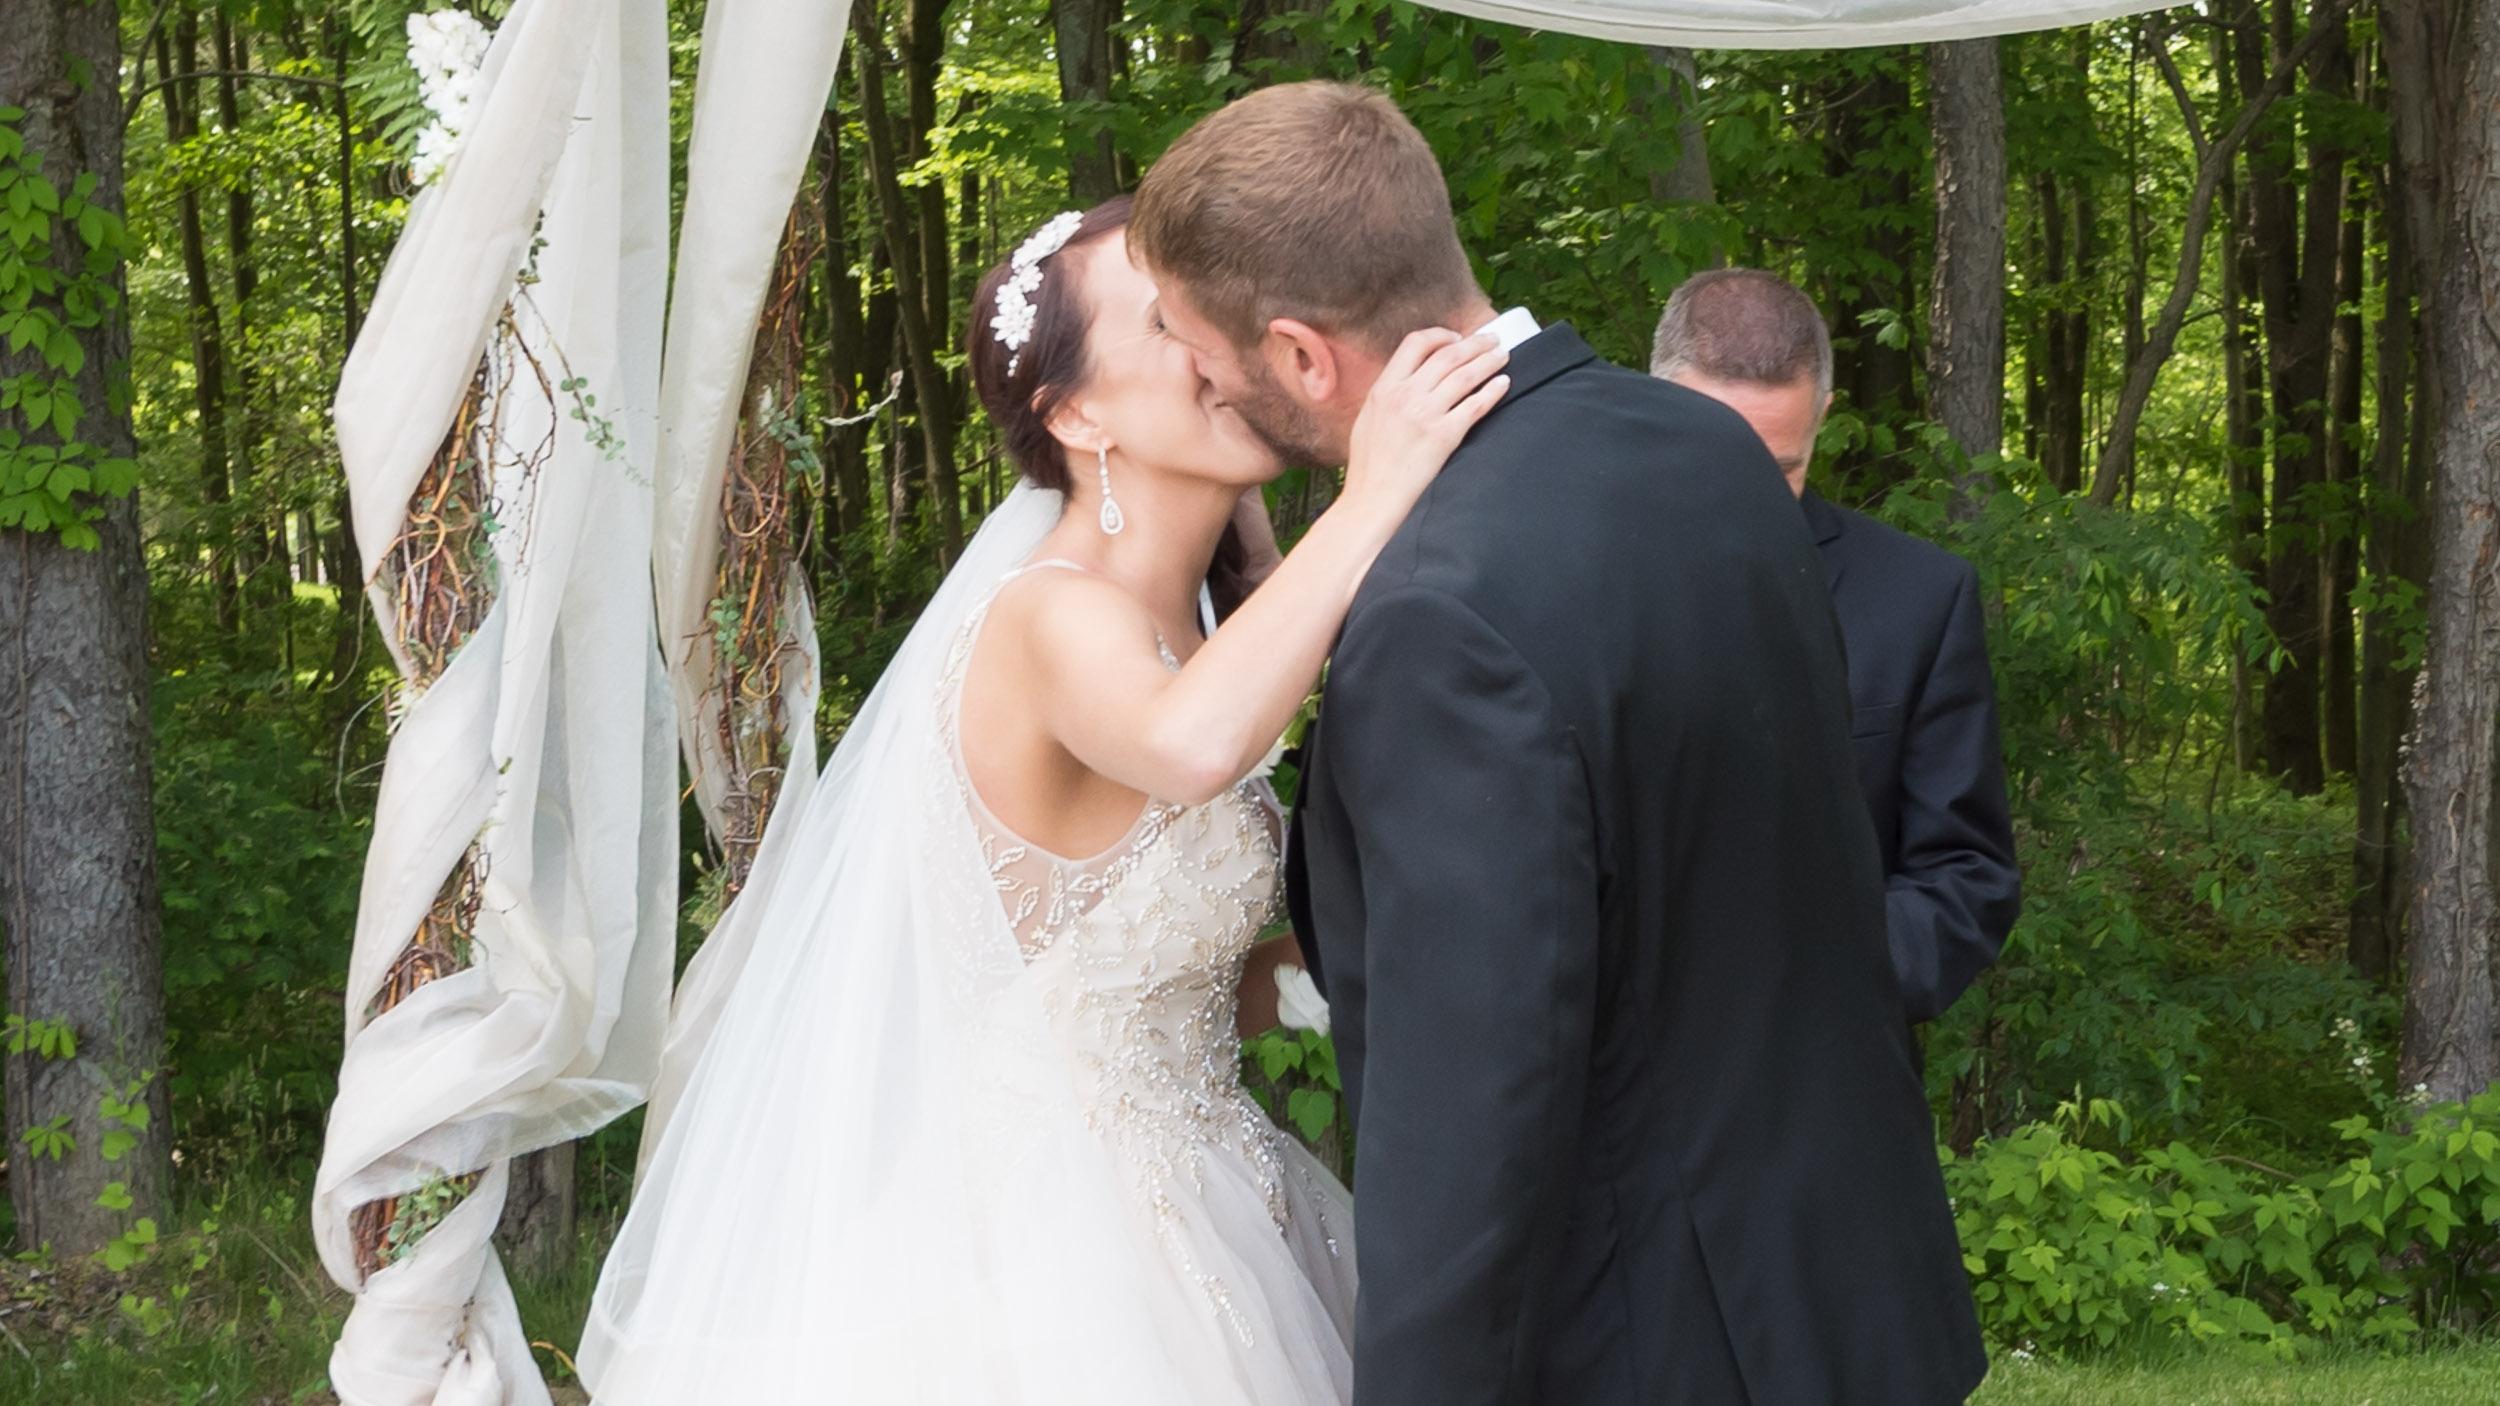 Bride-and-groom-first-kiss-outdoor-wedding.jpg